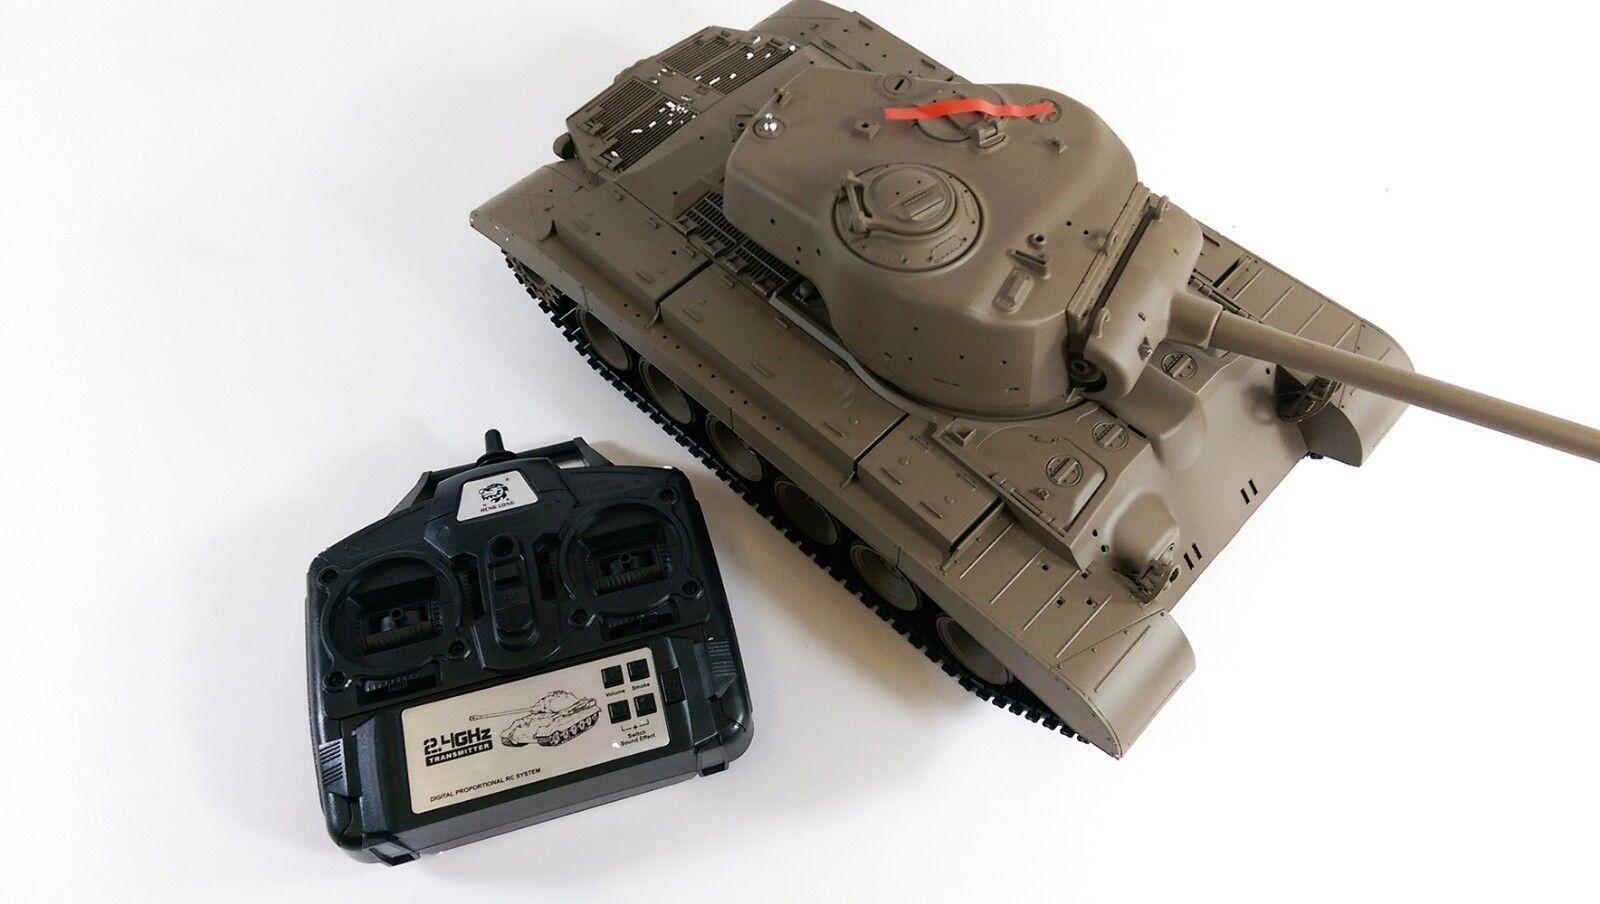 2.4GHz Radio Control Battle R C Snow Leopard RC Tank BB Smoke Sound Heng Long